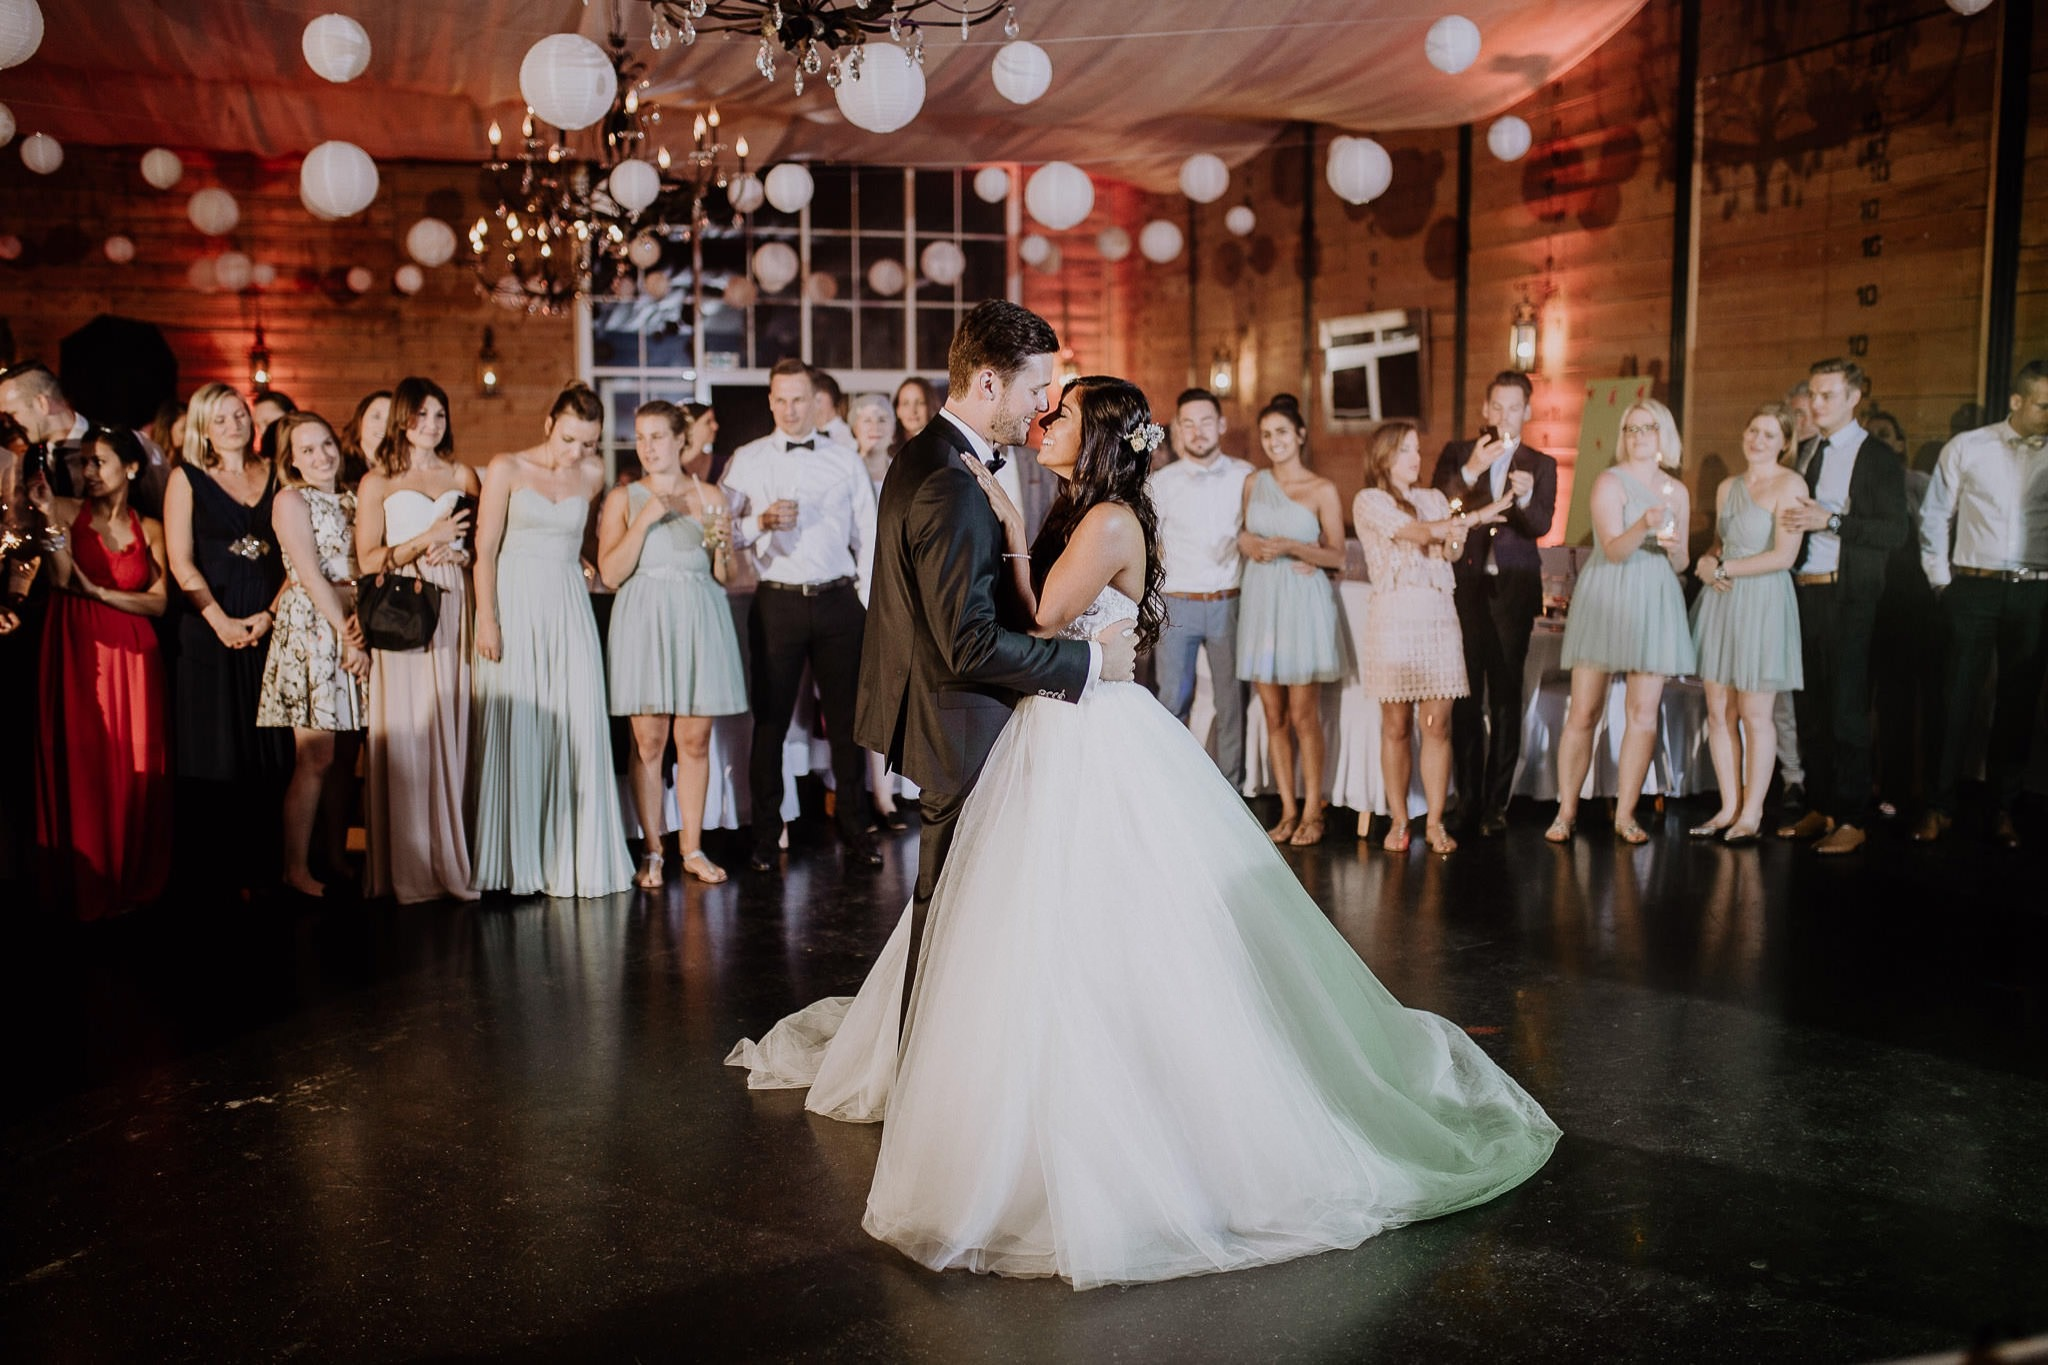 wedding photographer hamilton new zealand 1067 1